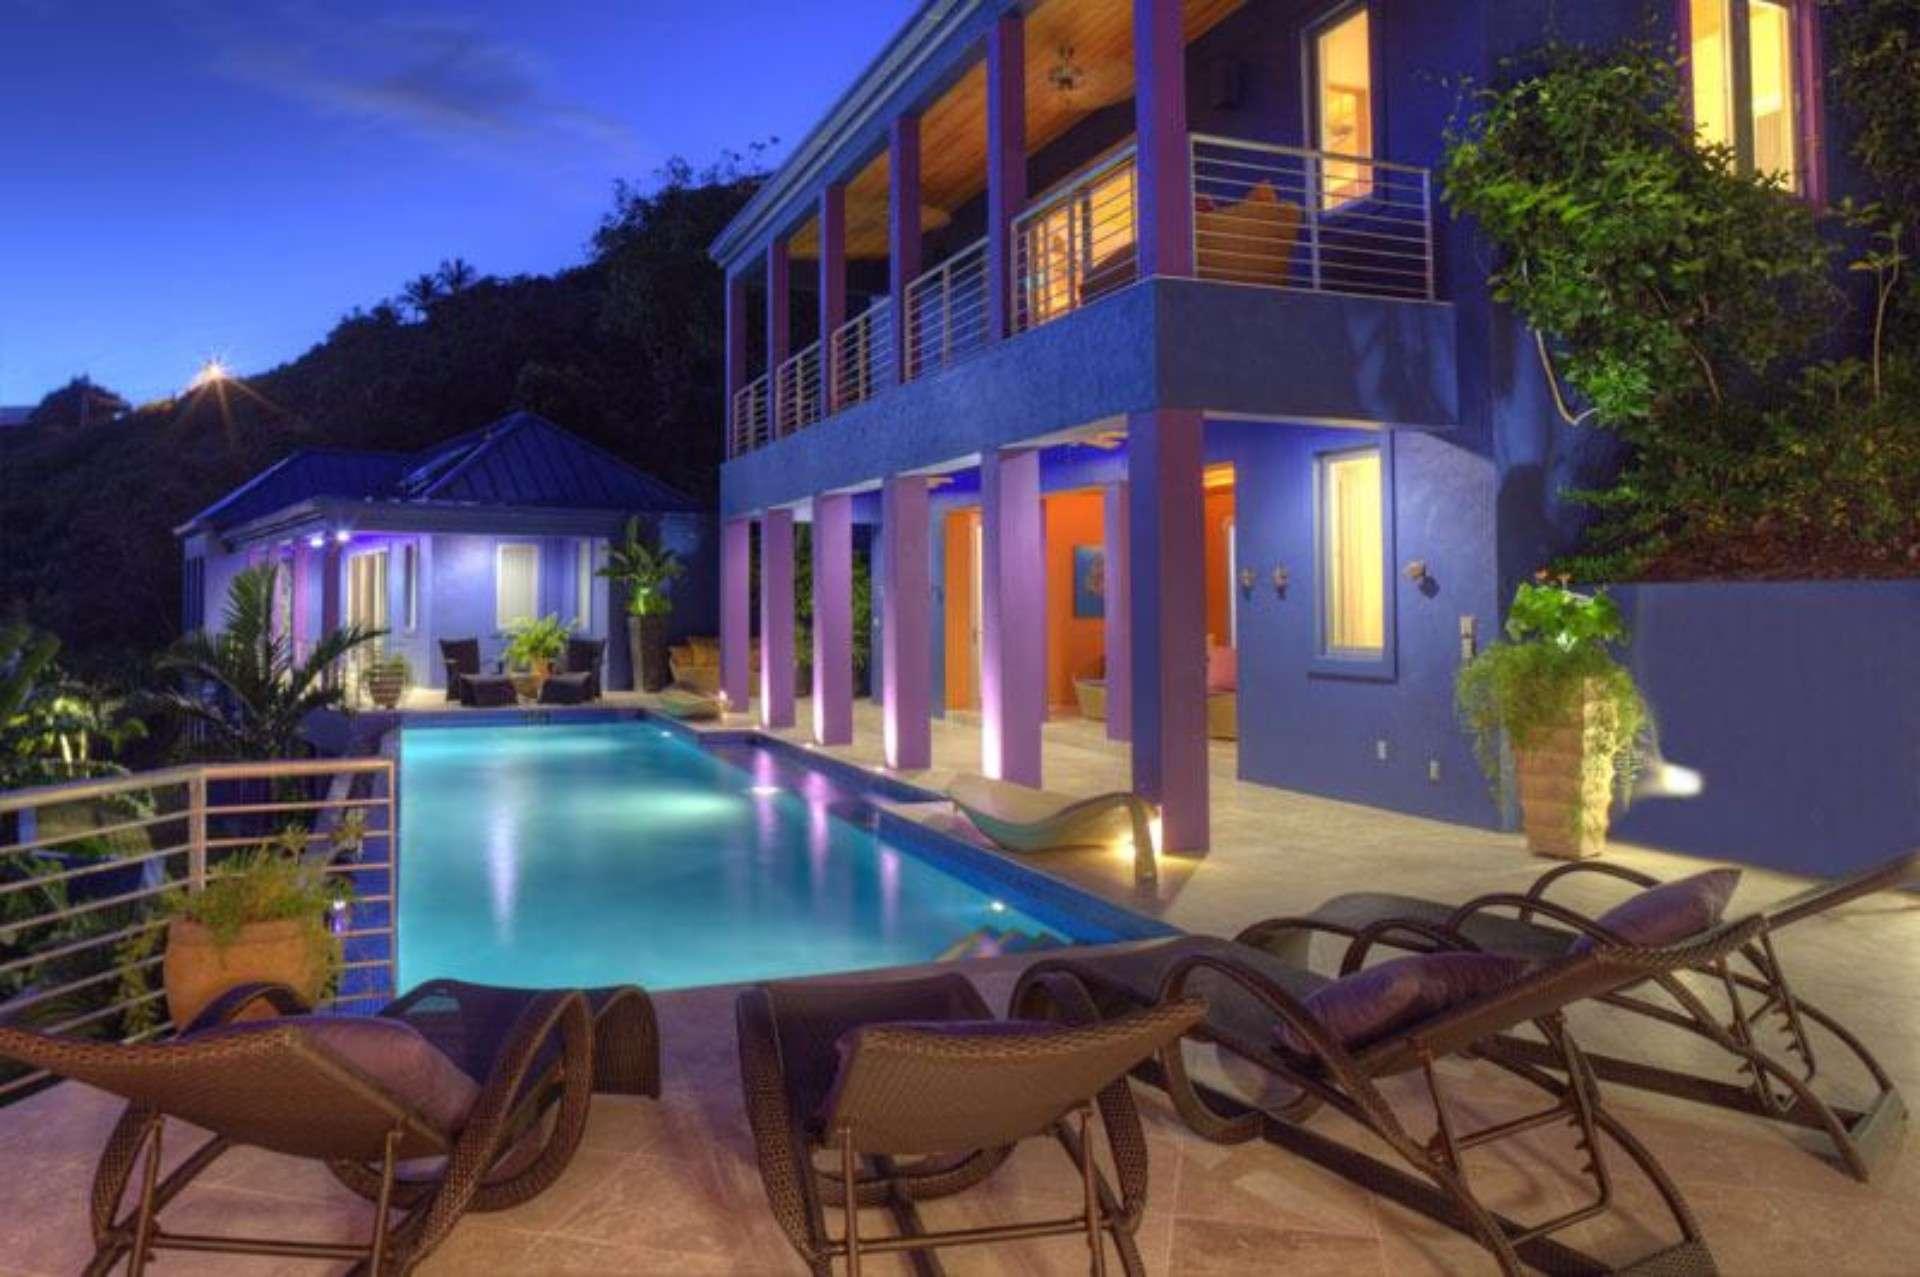 Luxury villa rentals caribbean - Usvi - St john - Rendezvous bay - Mare Blu - Image 1/18